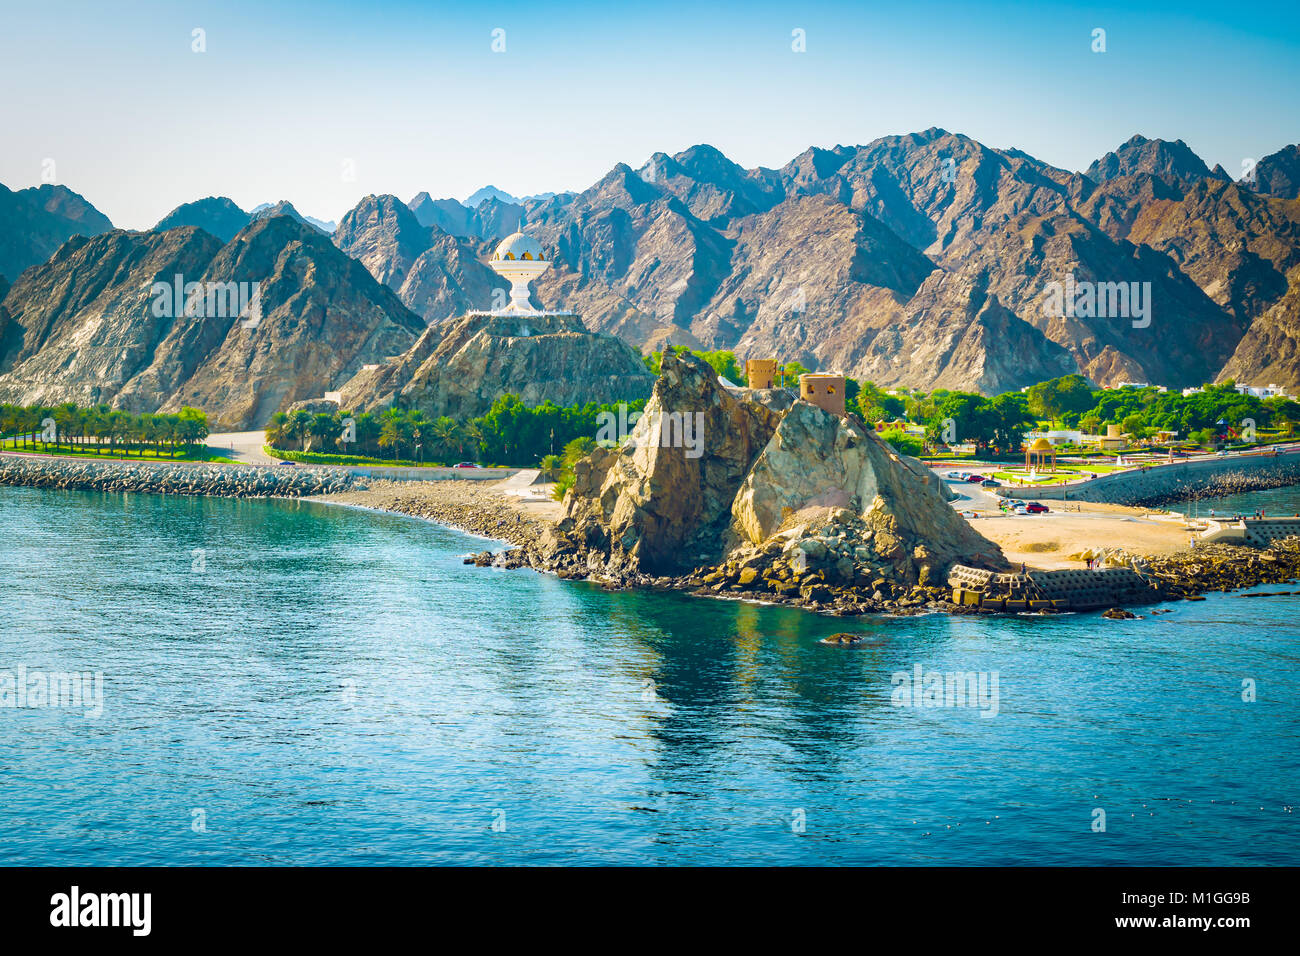 Muscat, Omán. Paisaje de montaña. Imagen De Stock